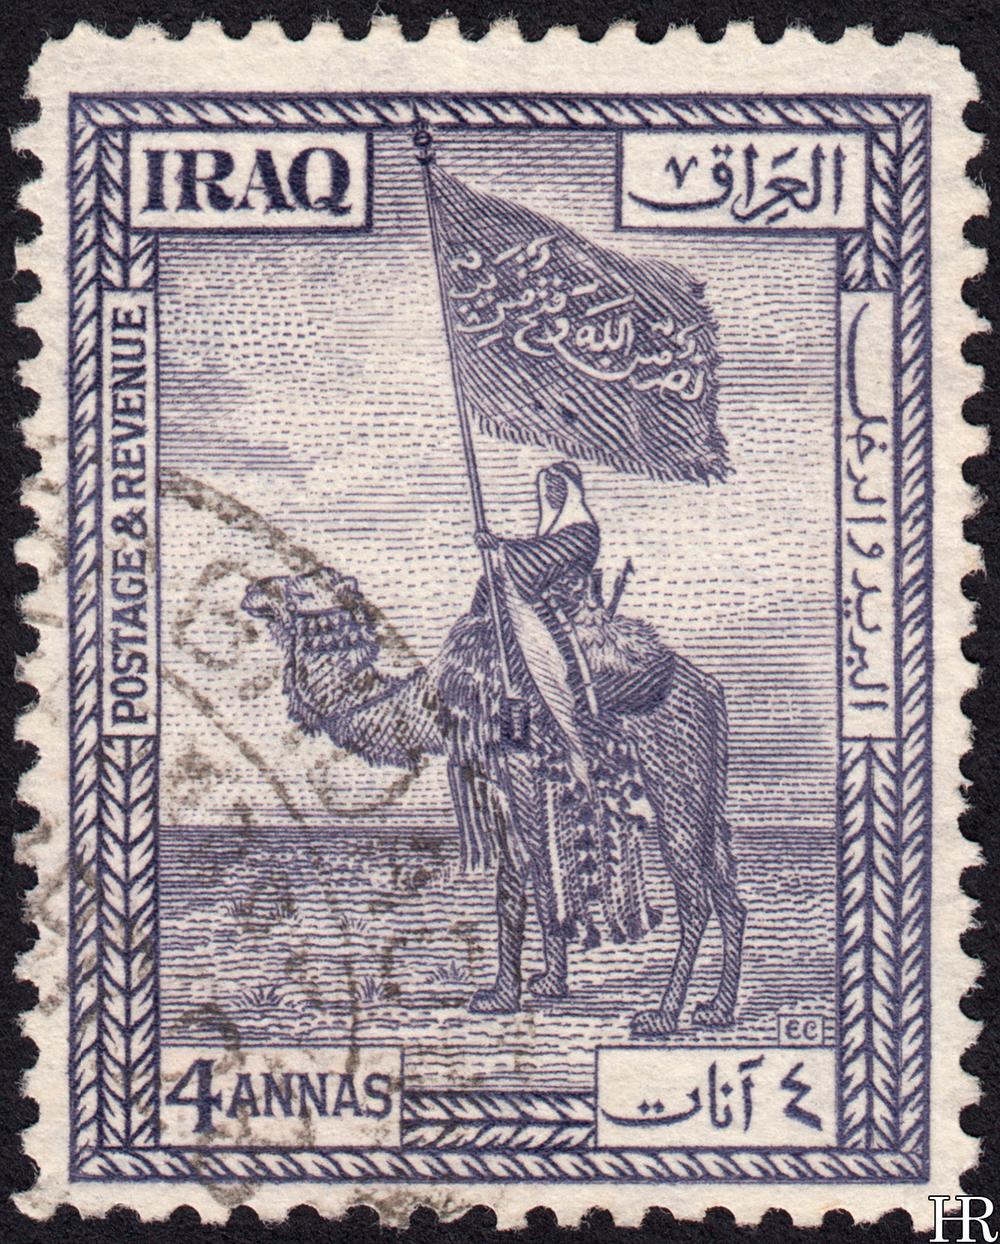 4 annas - Dulaim Camel Corps